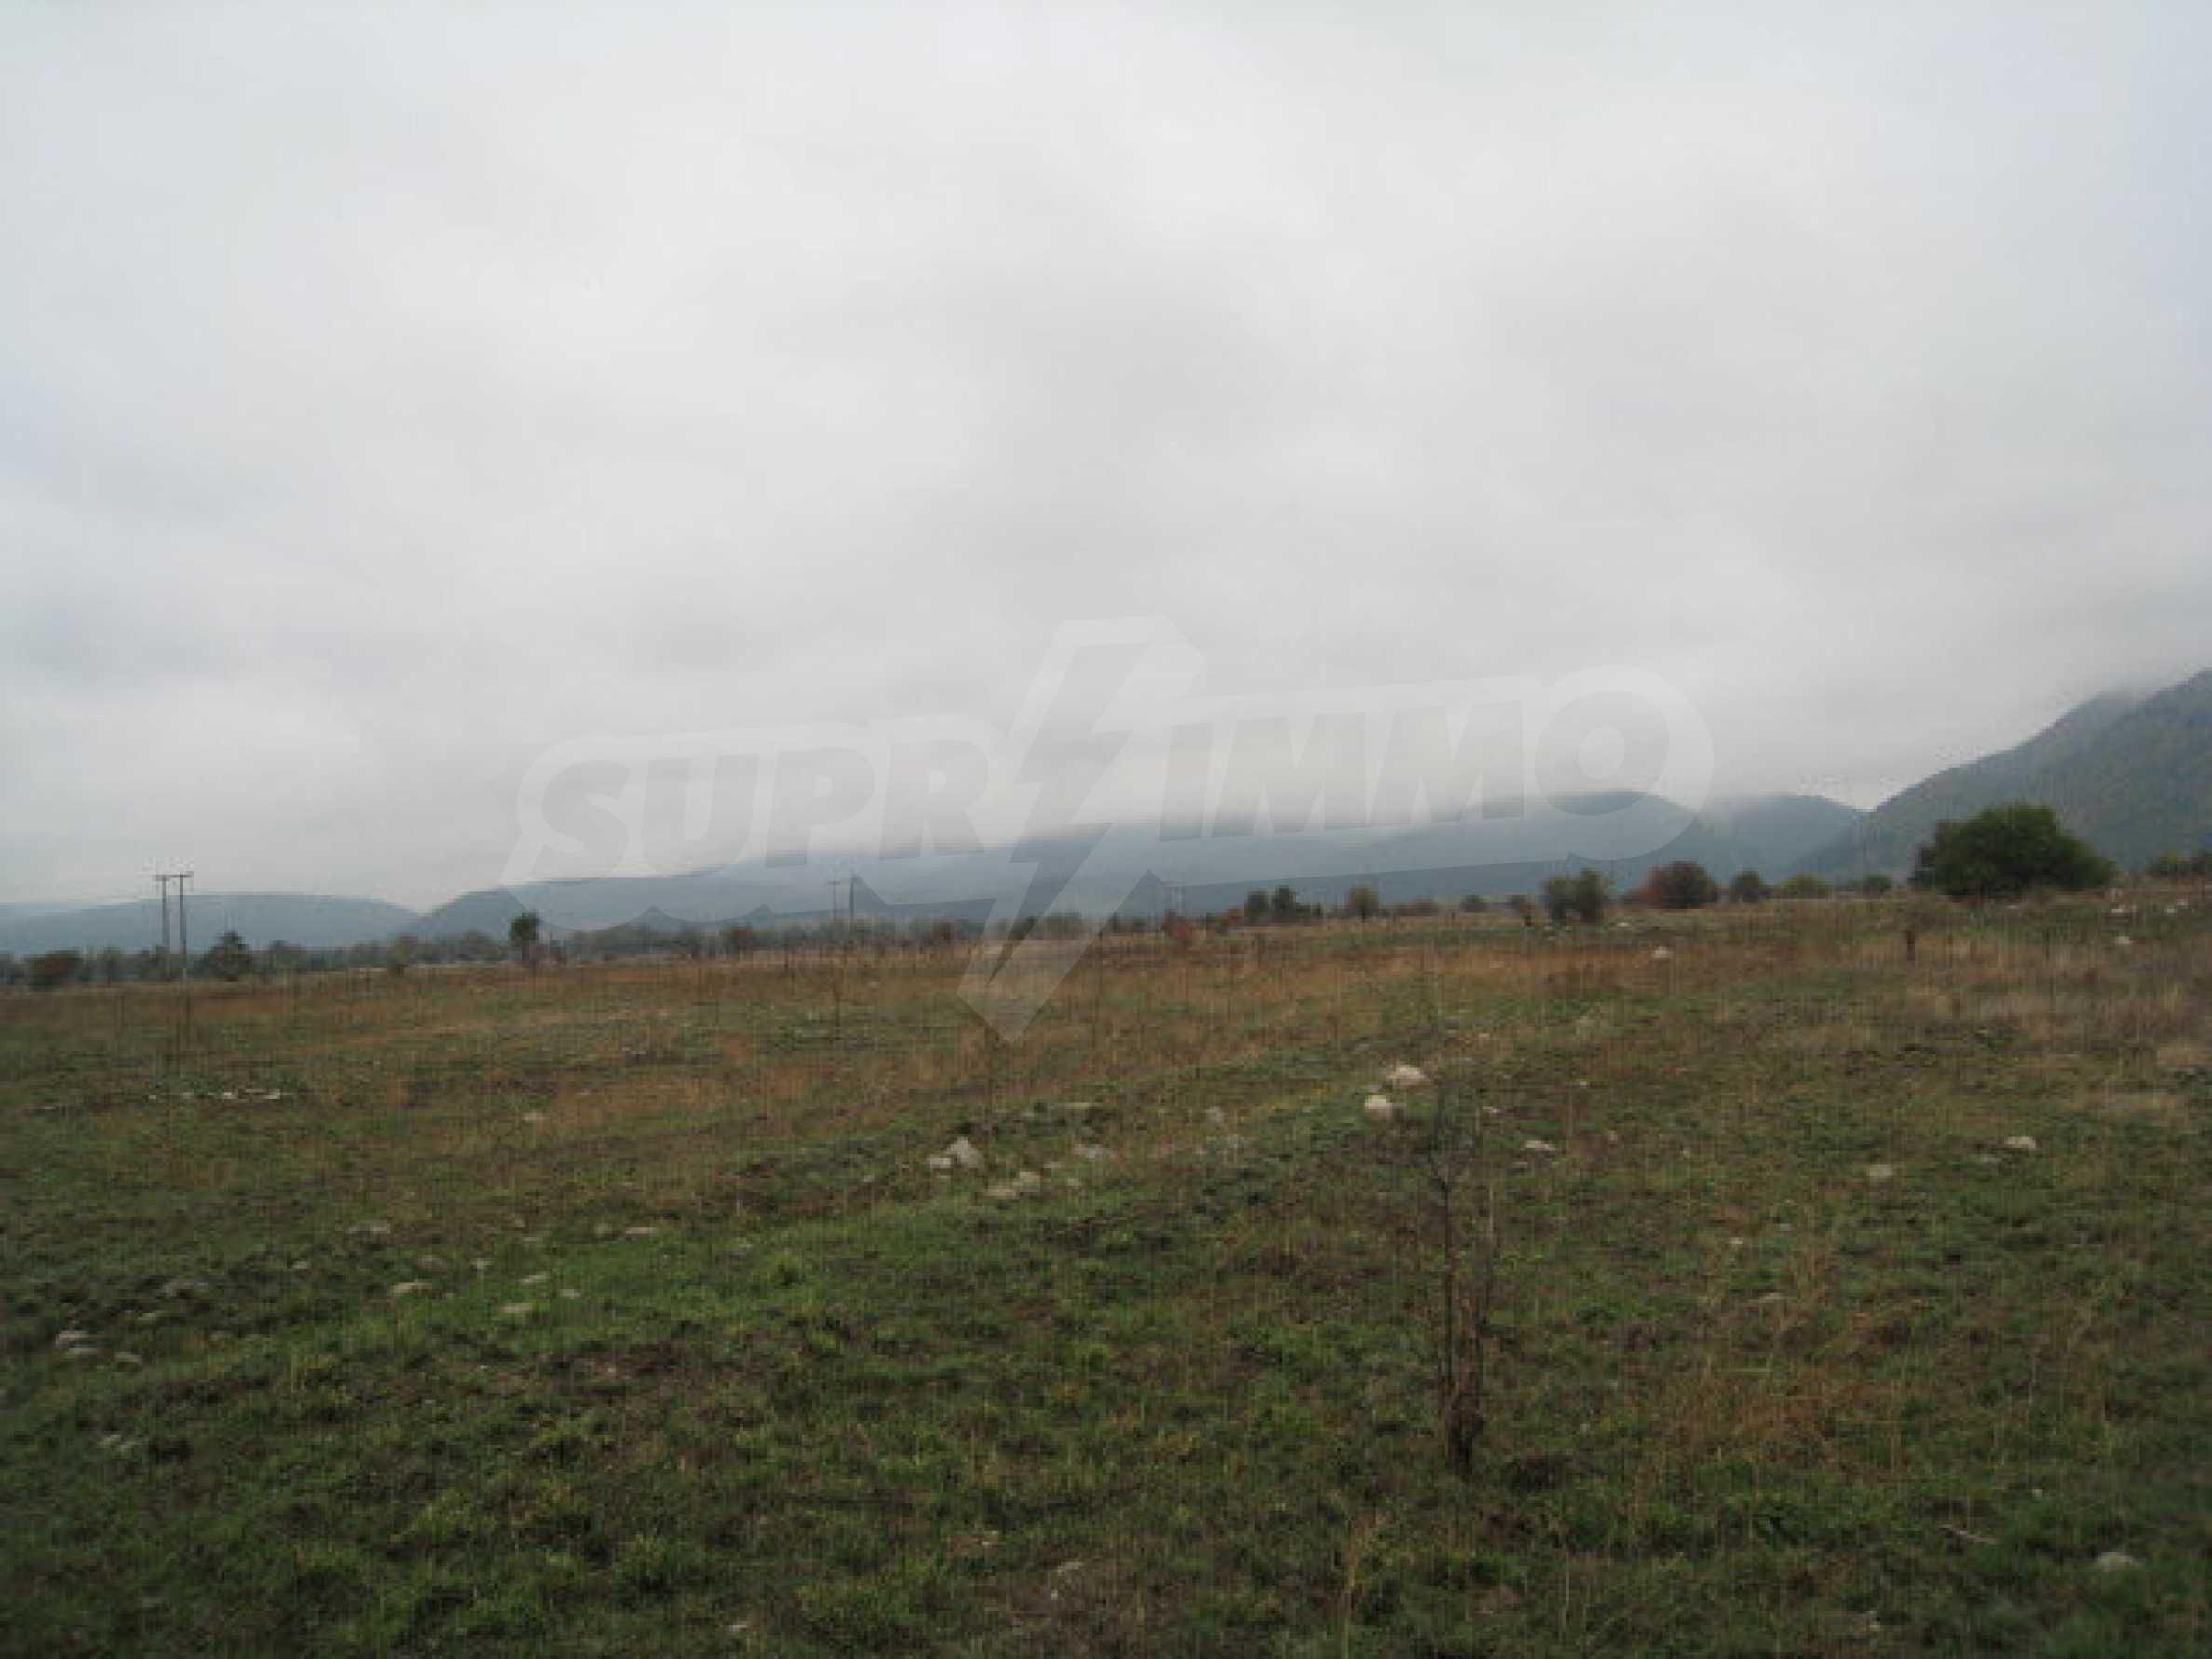 Development land 14 km away from Borovets 2